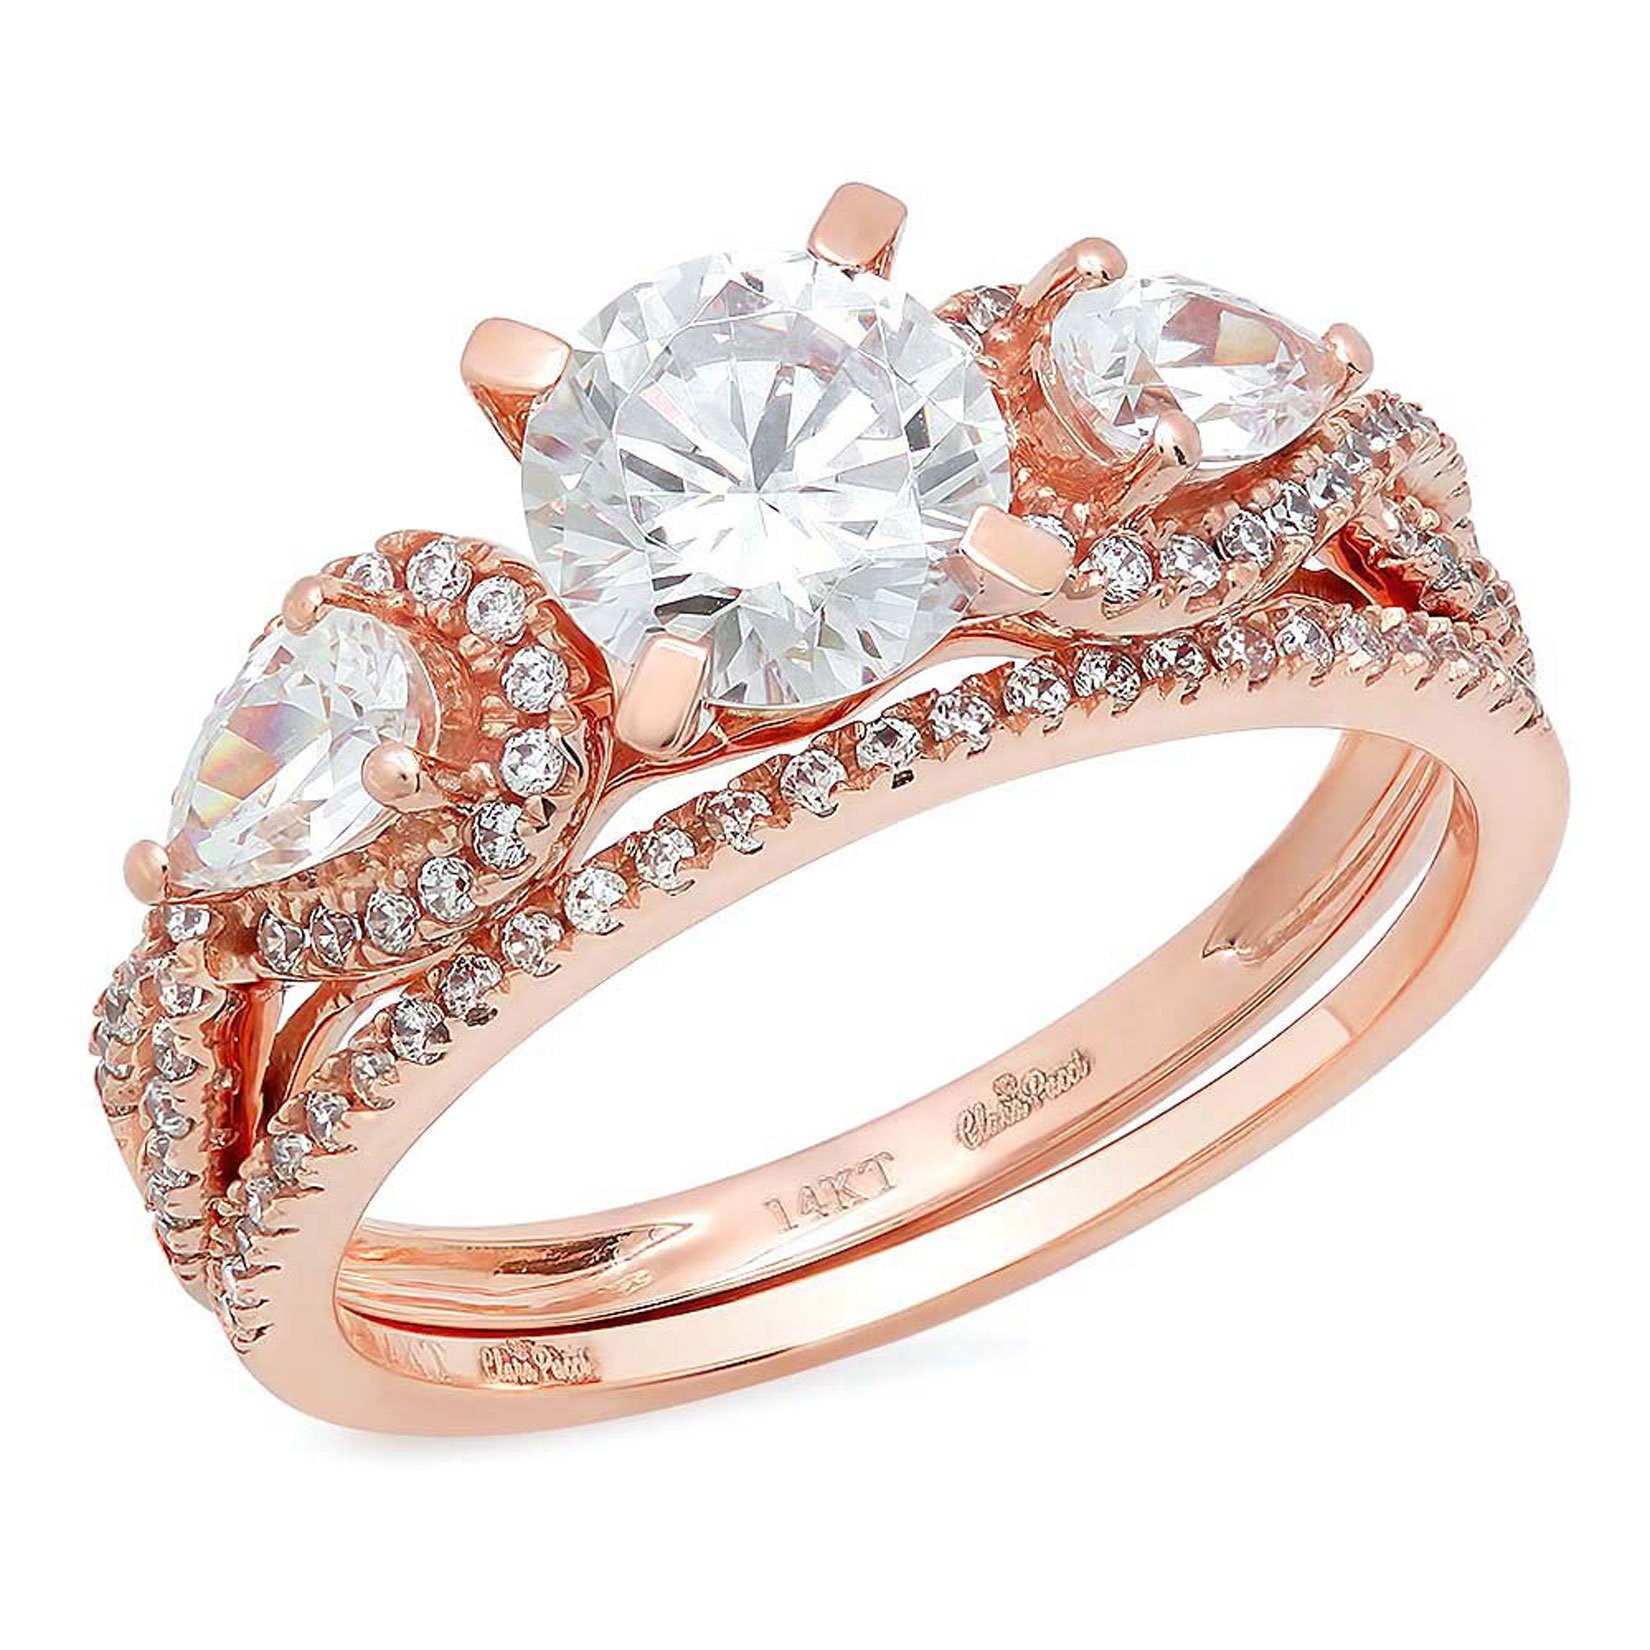 Clara Pucci 2.0 CT Round Pear Cut CZ Pave Halo Bridal Engagement Wedding Ring Band Set 14k Rose Gold, Size 8.75 by Clara Pucci